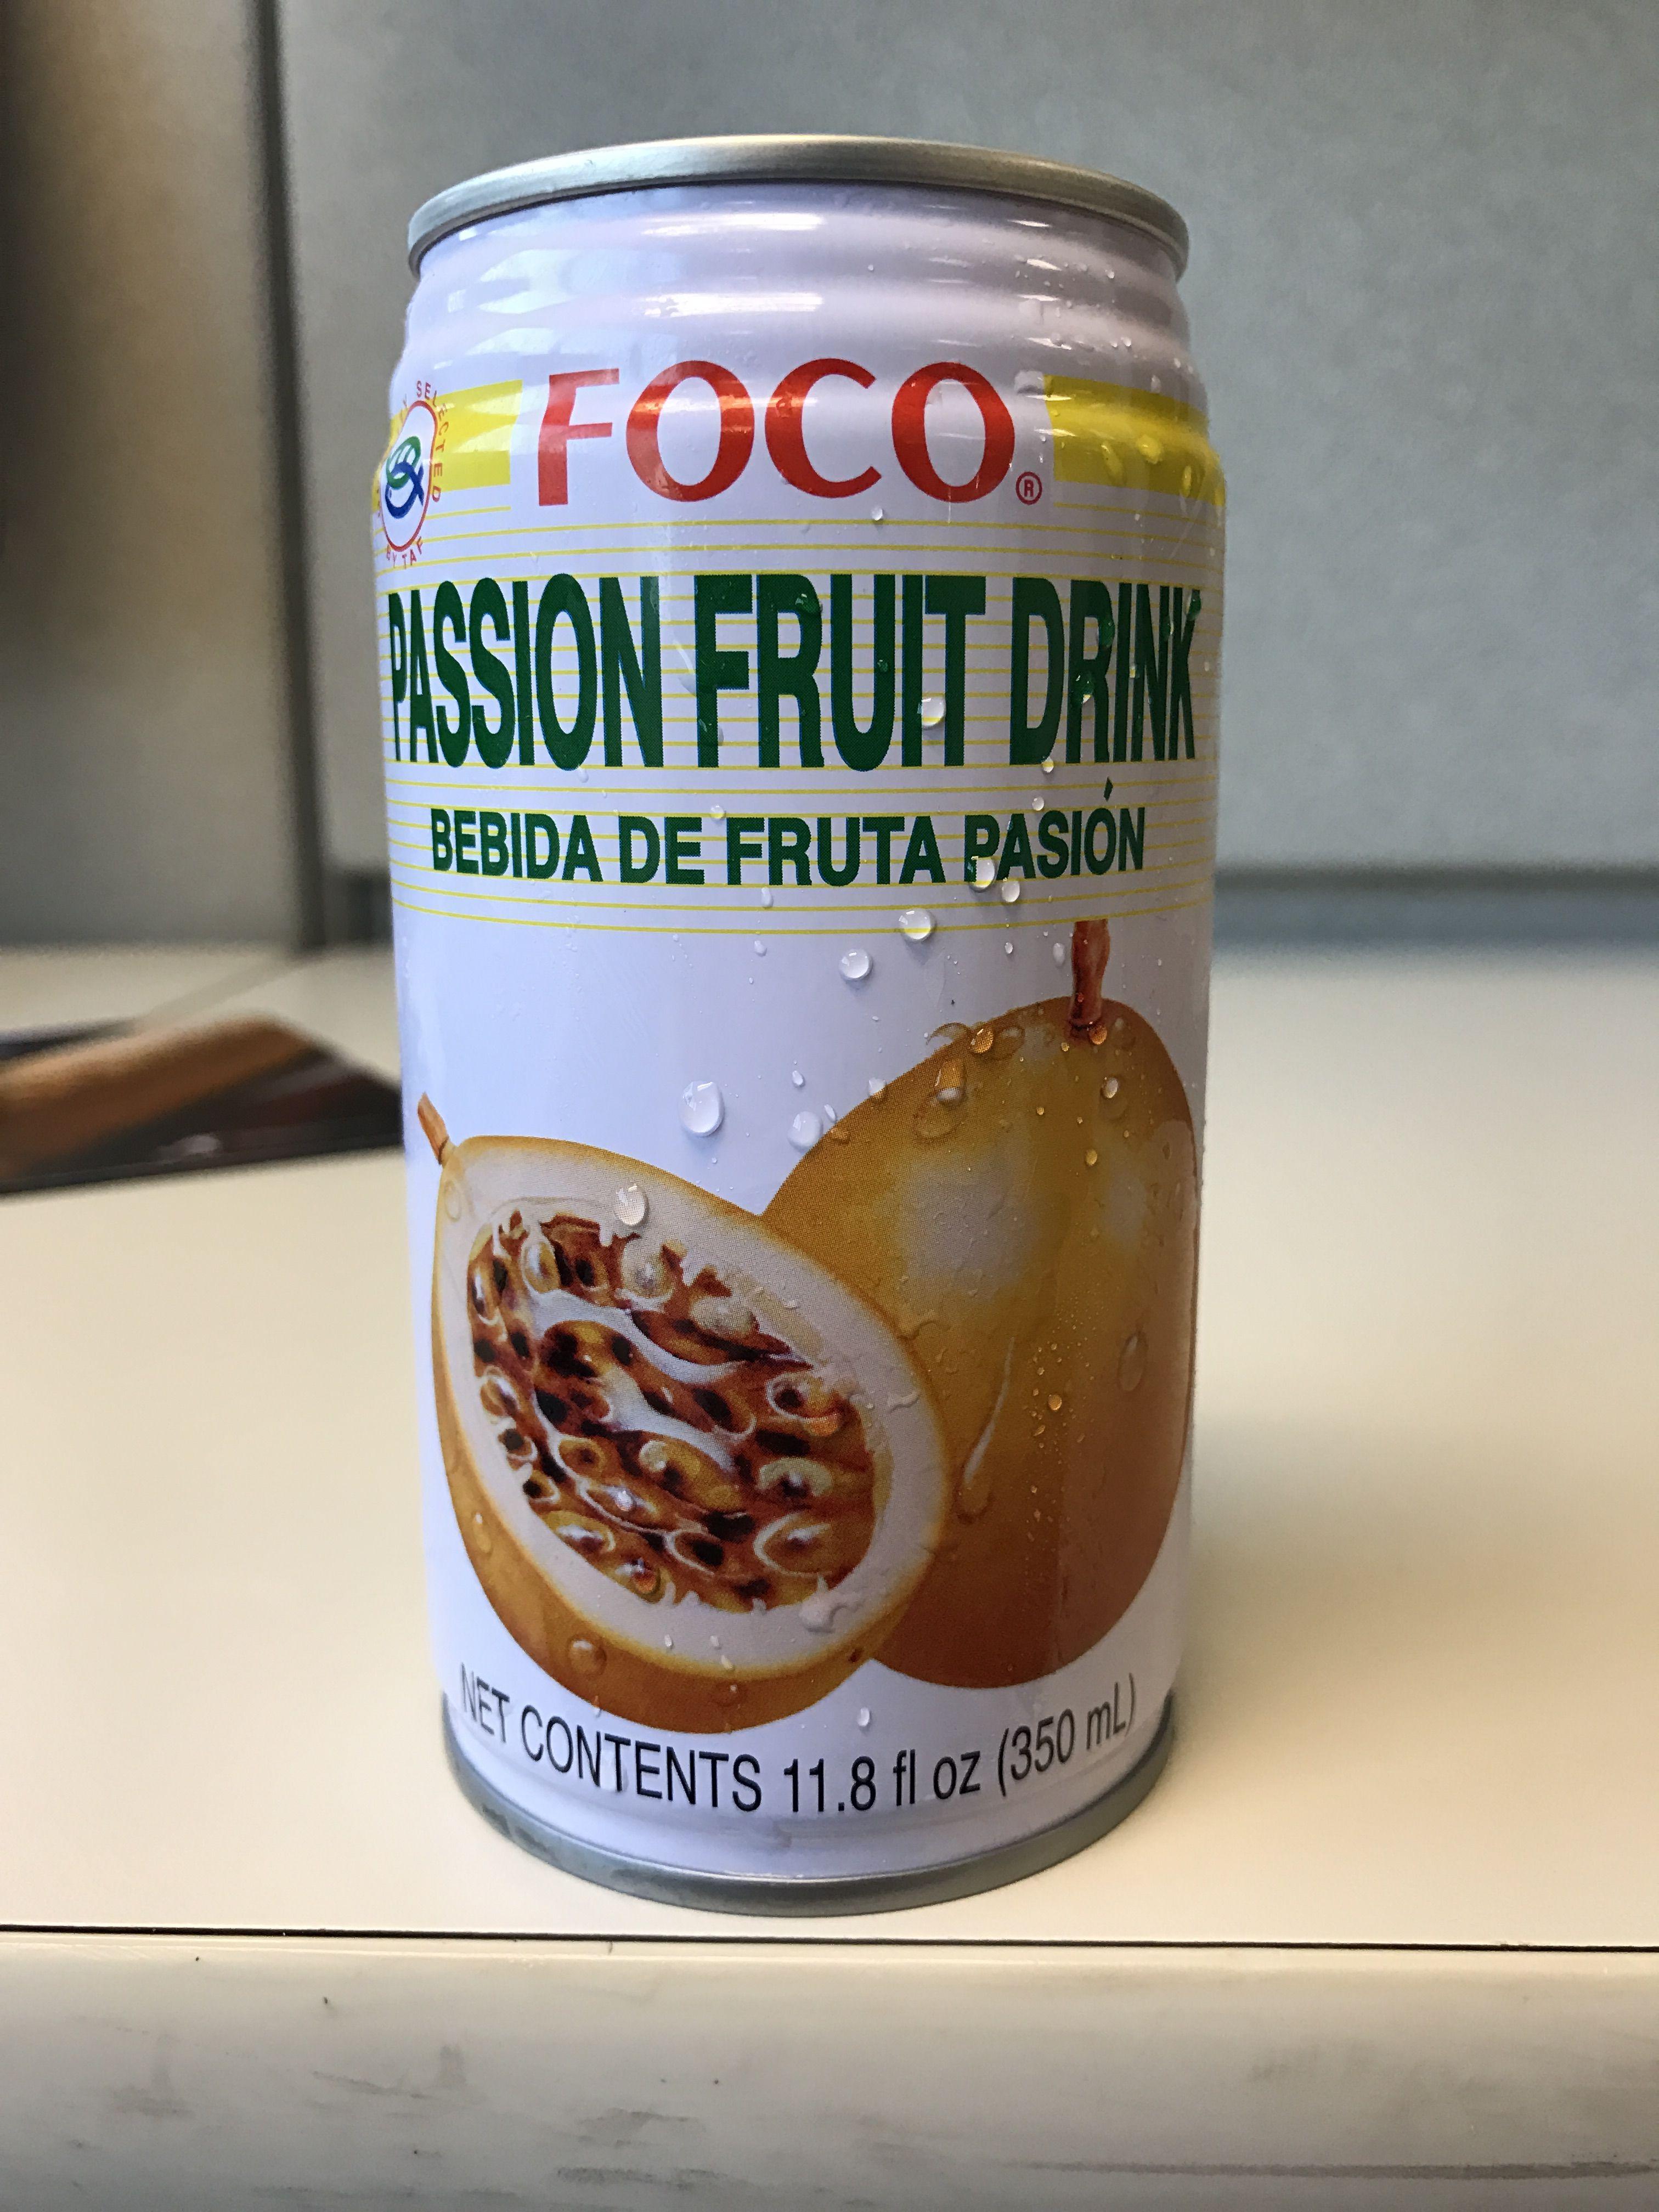 Foco passion fruit drink 25% juice